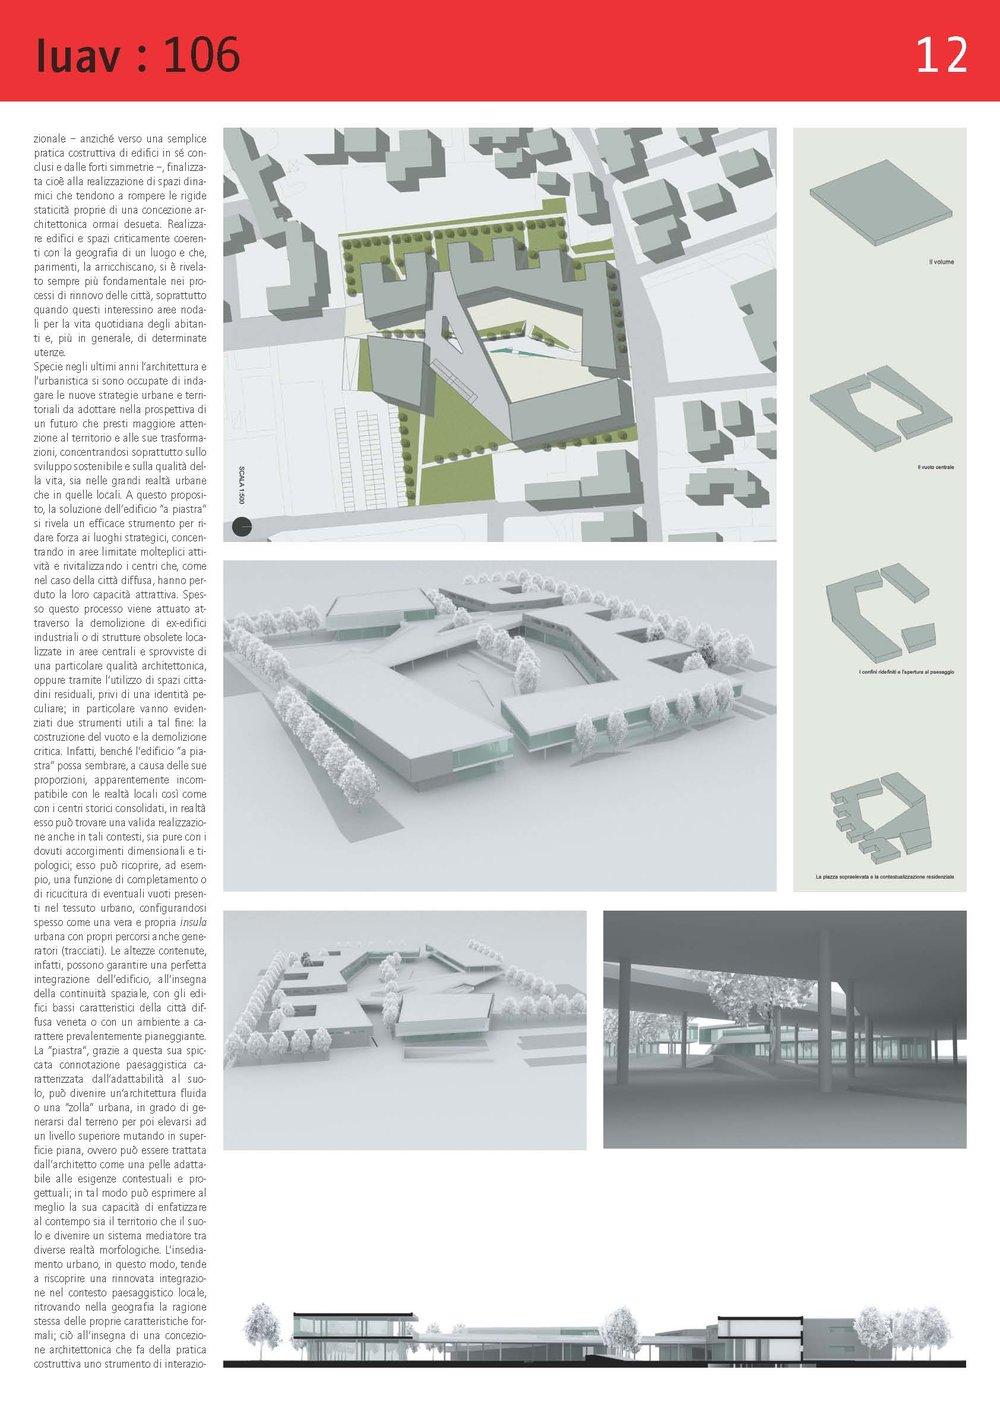 Copertine_Pagina_13.jpg